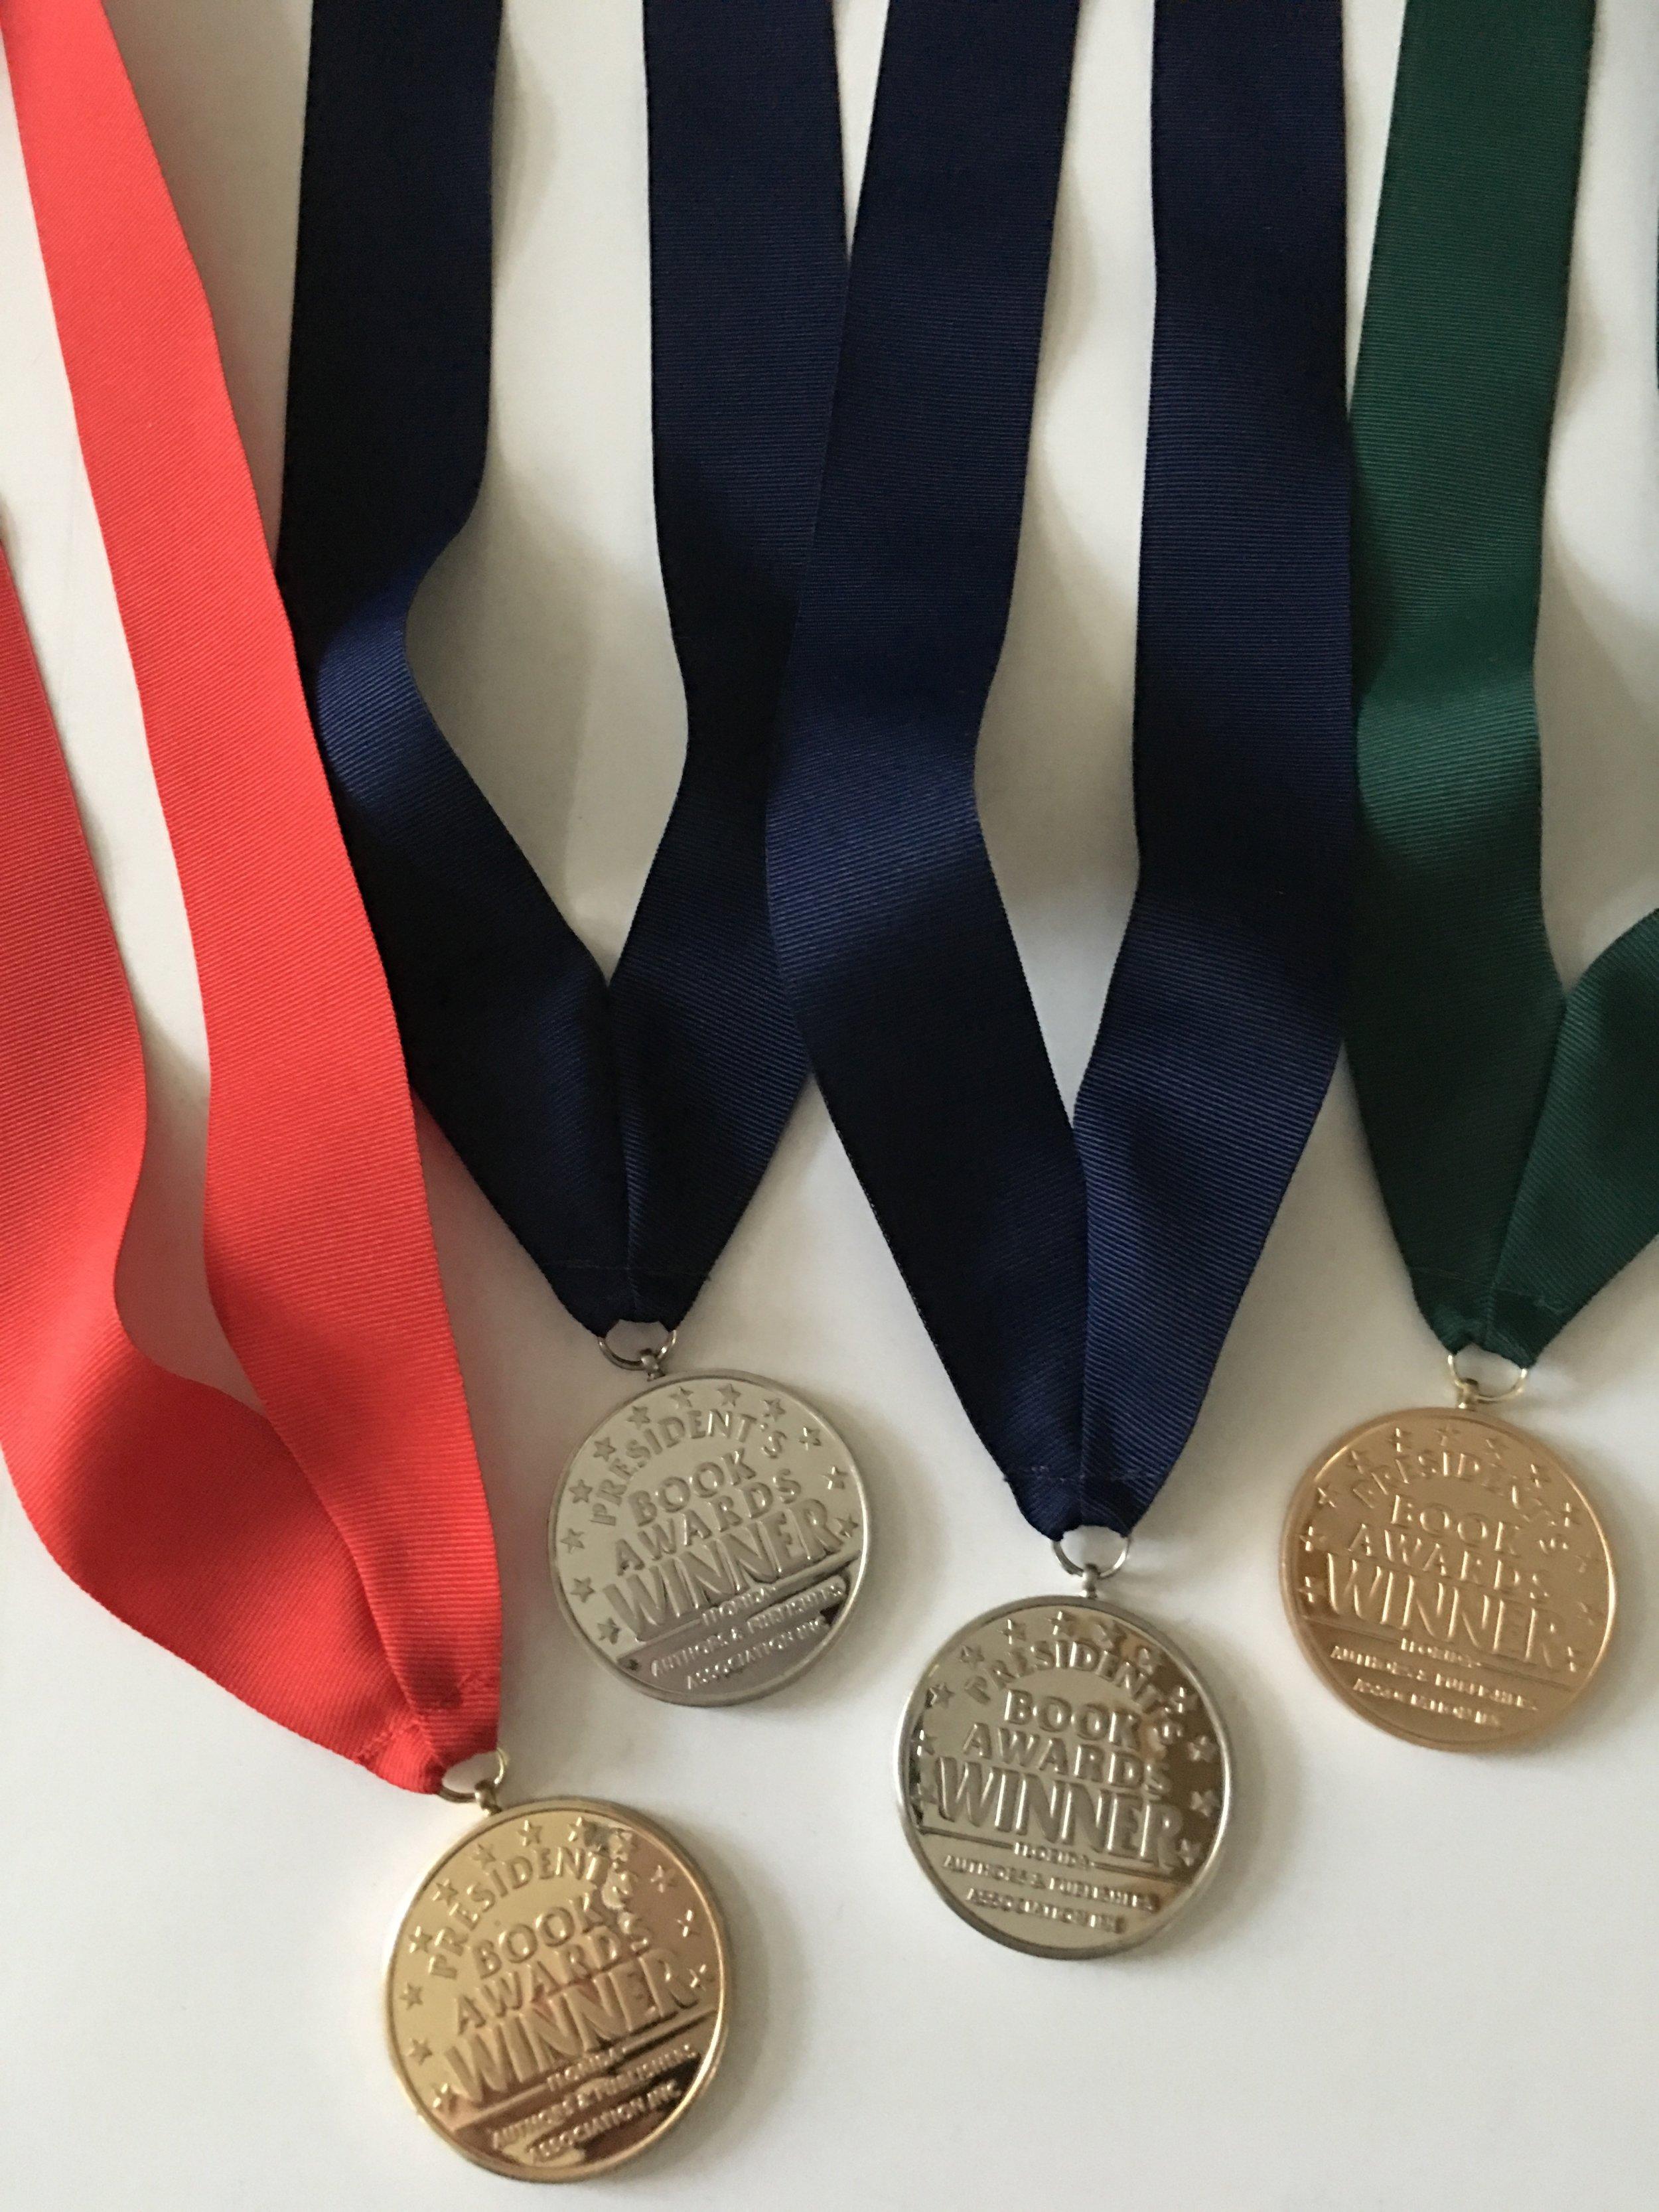 2018 - Four FAPA Awards